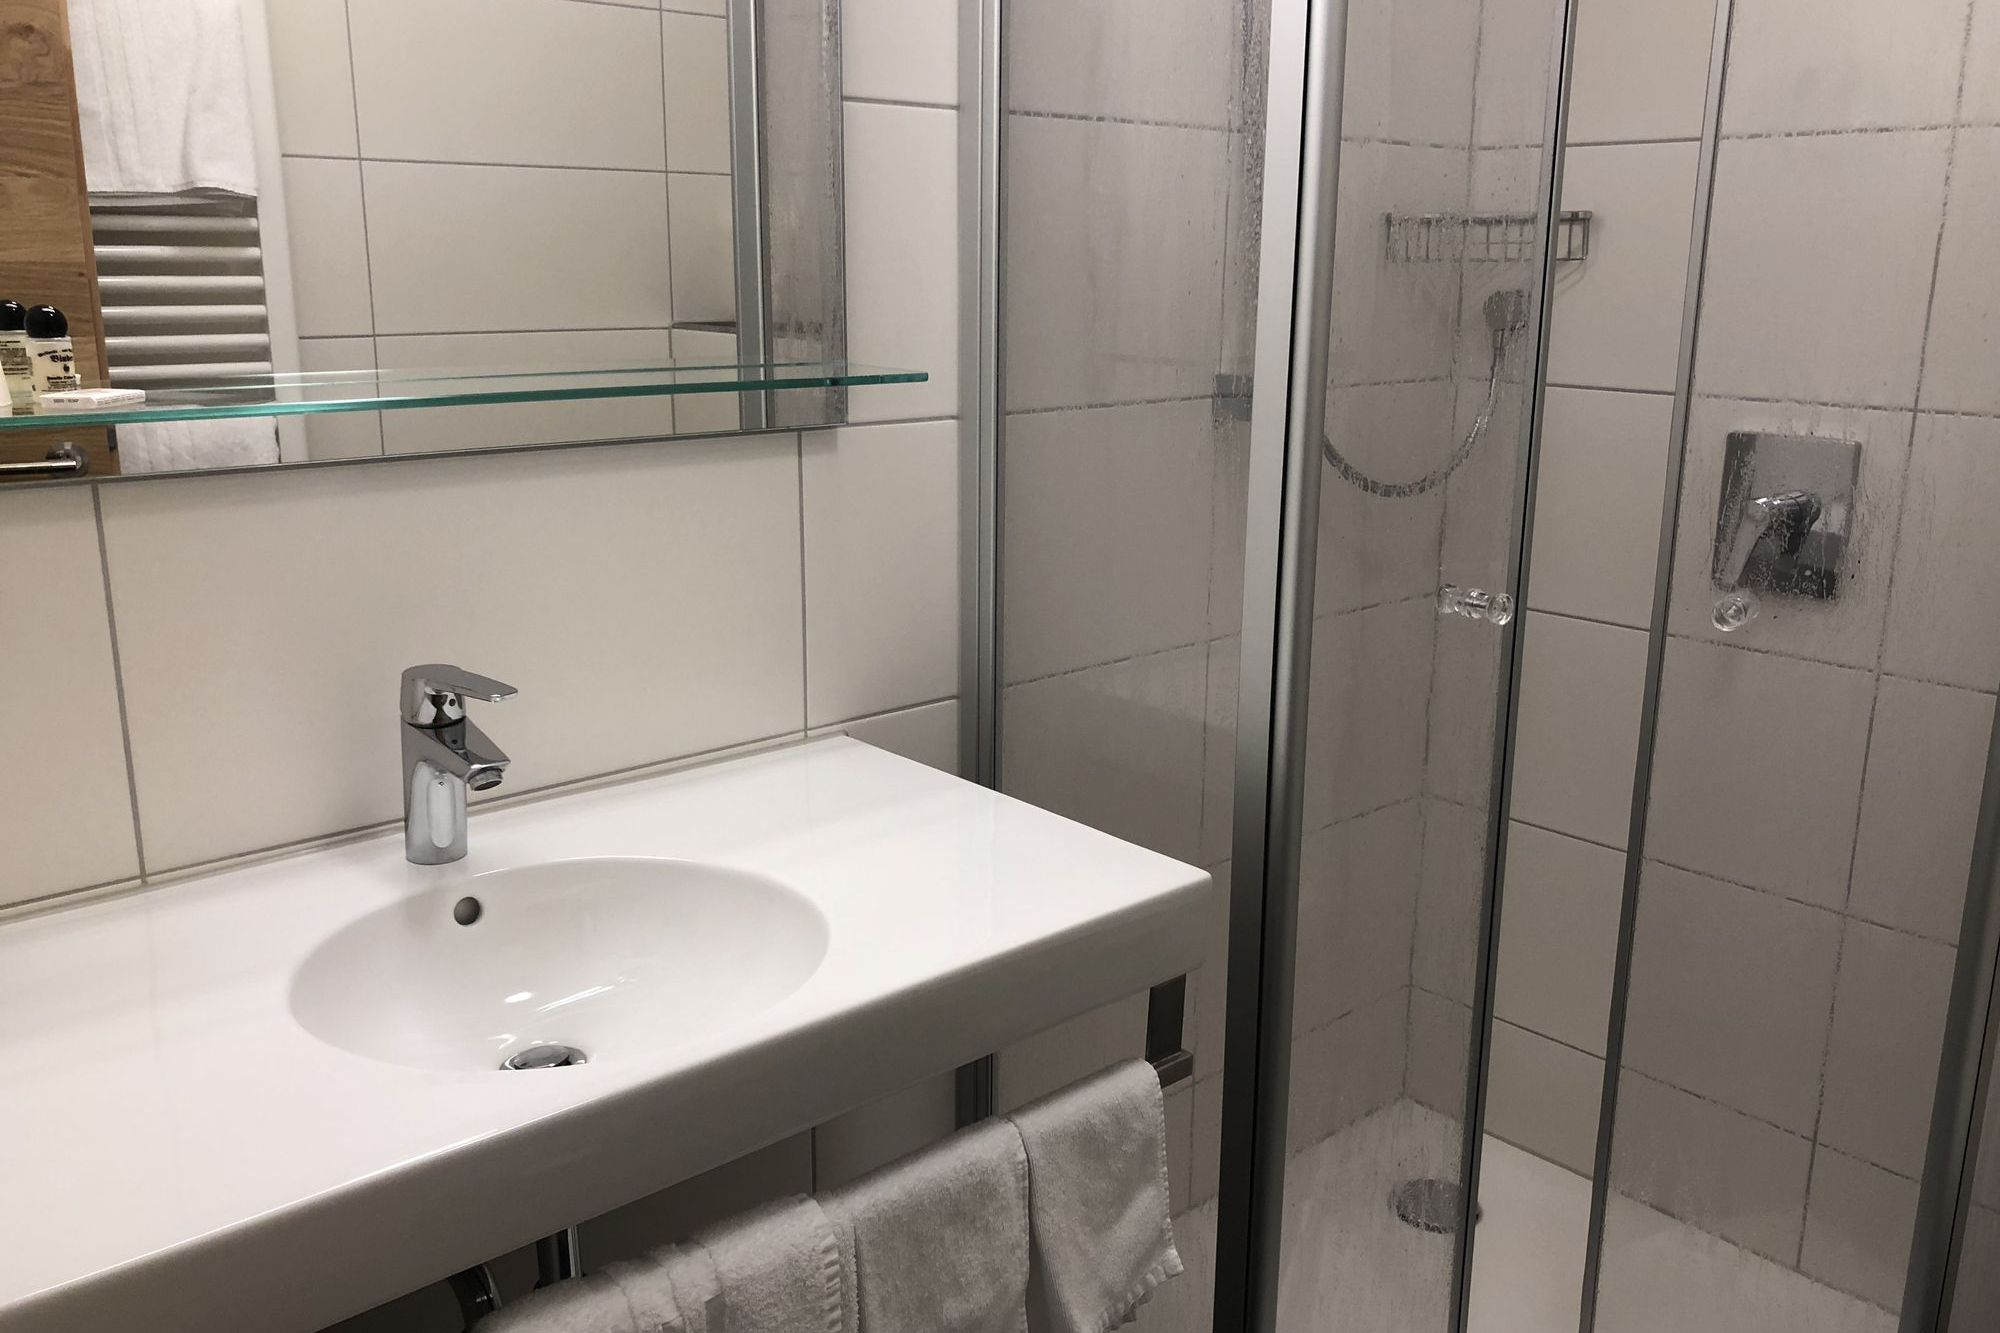 https://www.hotelbinder.de/wp-content/uploads/einzelzimmer1_5.jpg